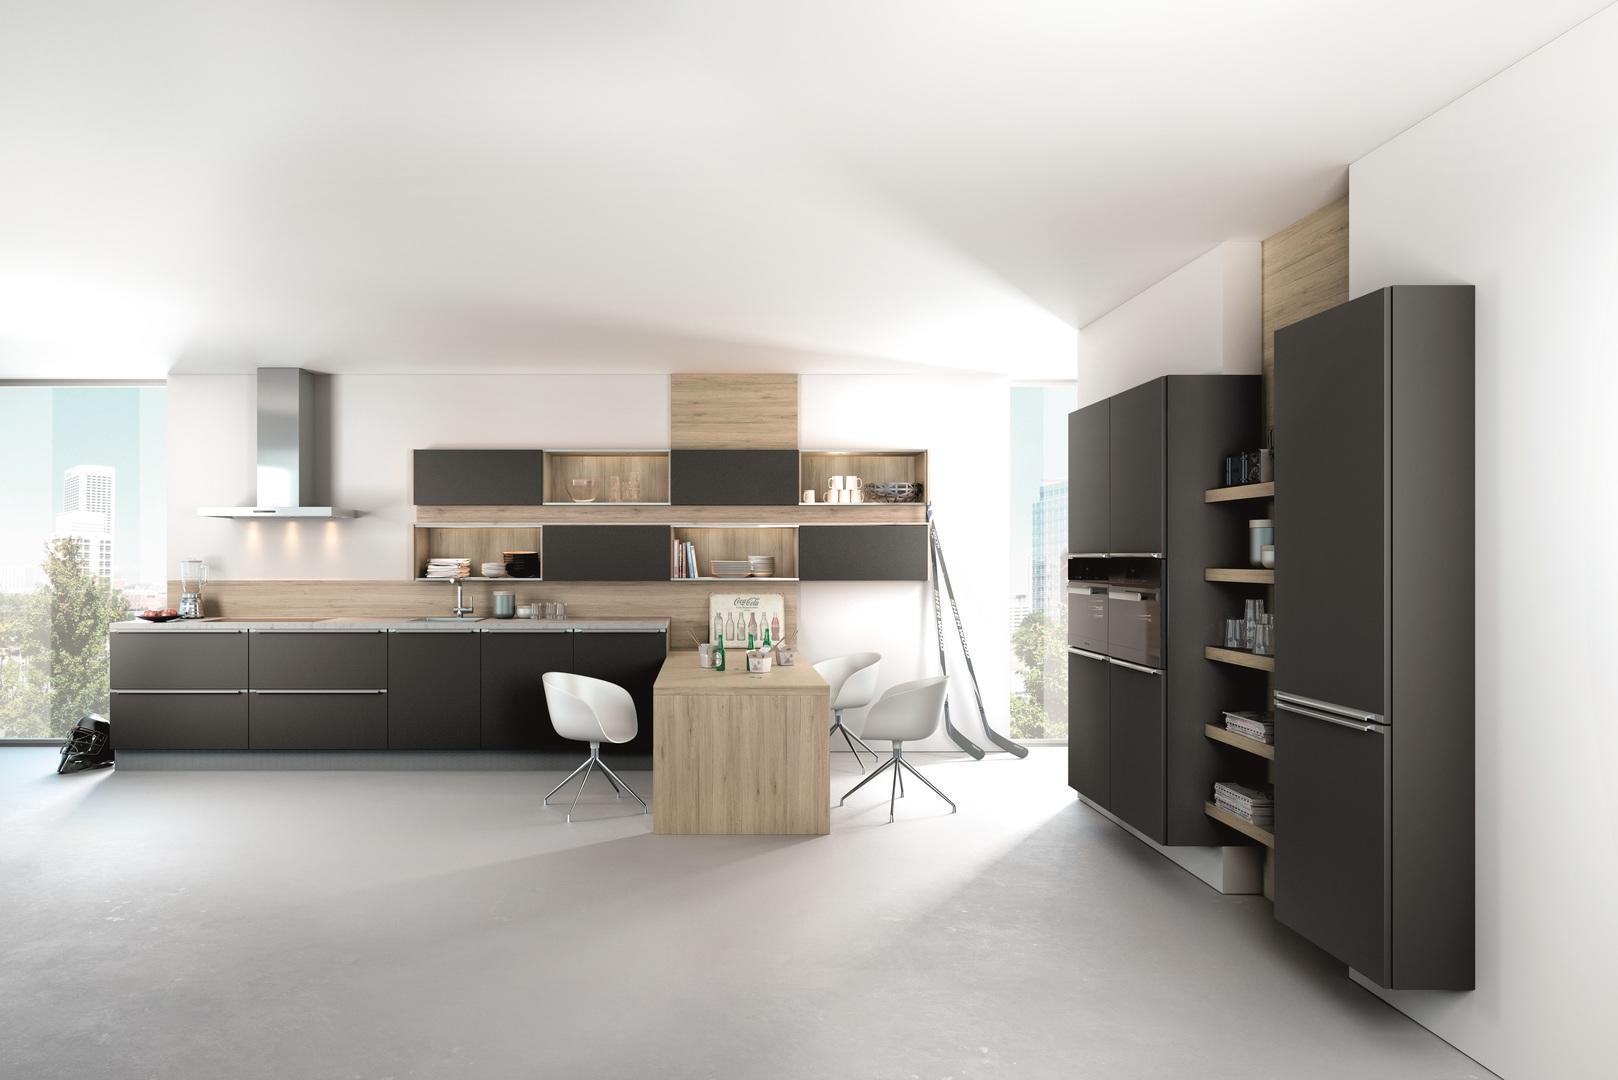 k che m belwelten kpl montage m belbau service stuhr. Black Bedroom Furniture Sets. Home Design Ideas